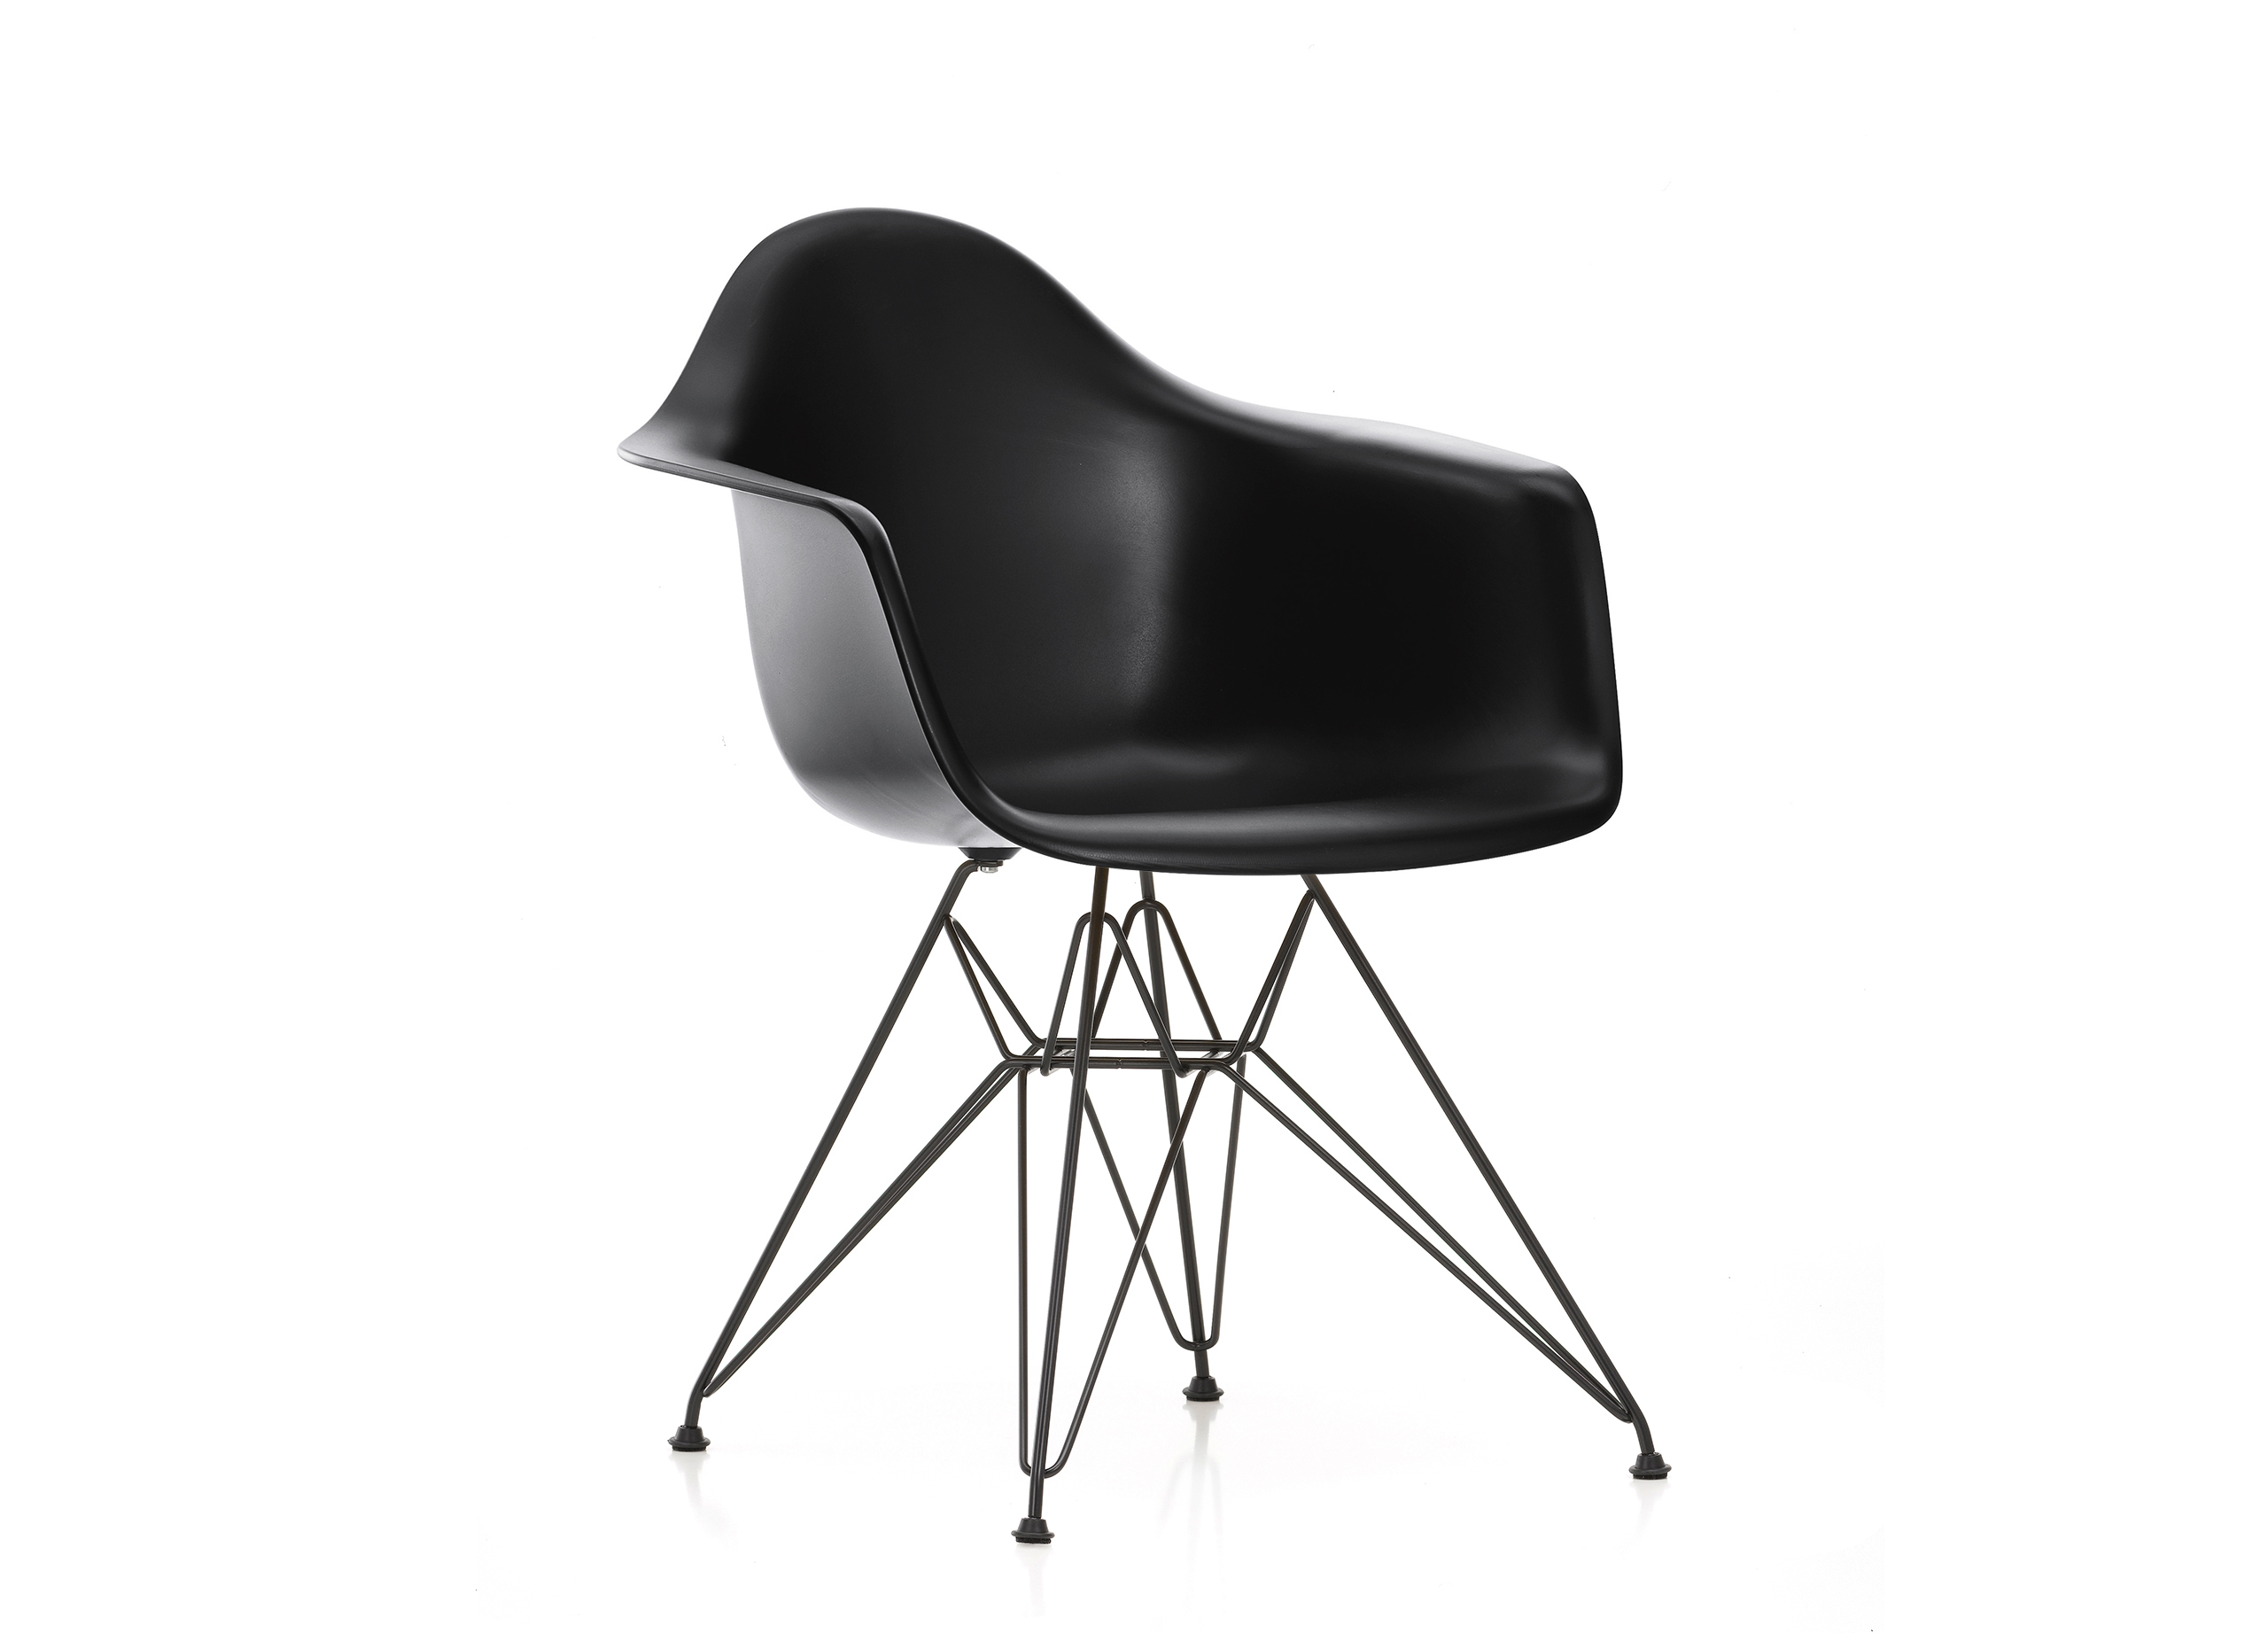 Eames Plastic Armchair : Vitra eames plastic armchair dar charles ray eames